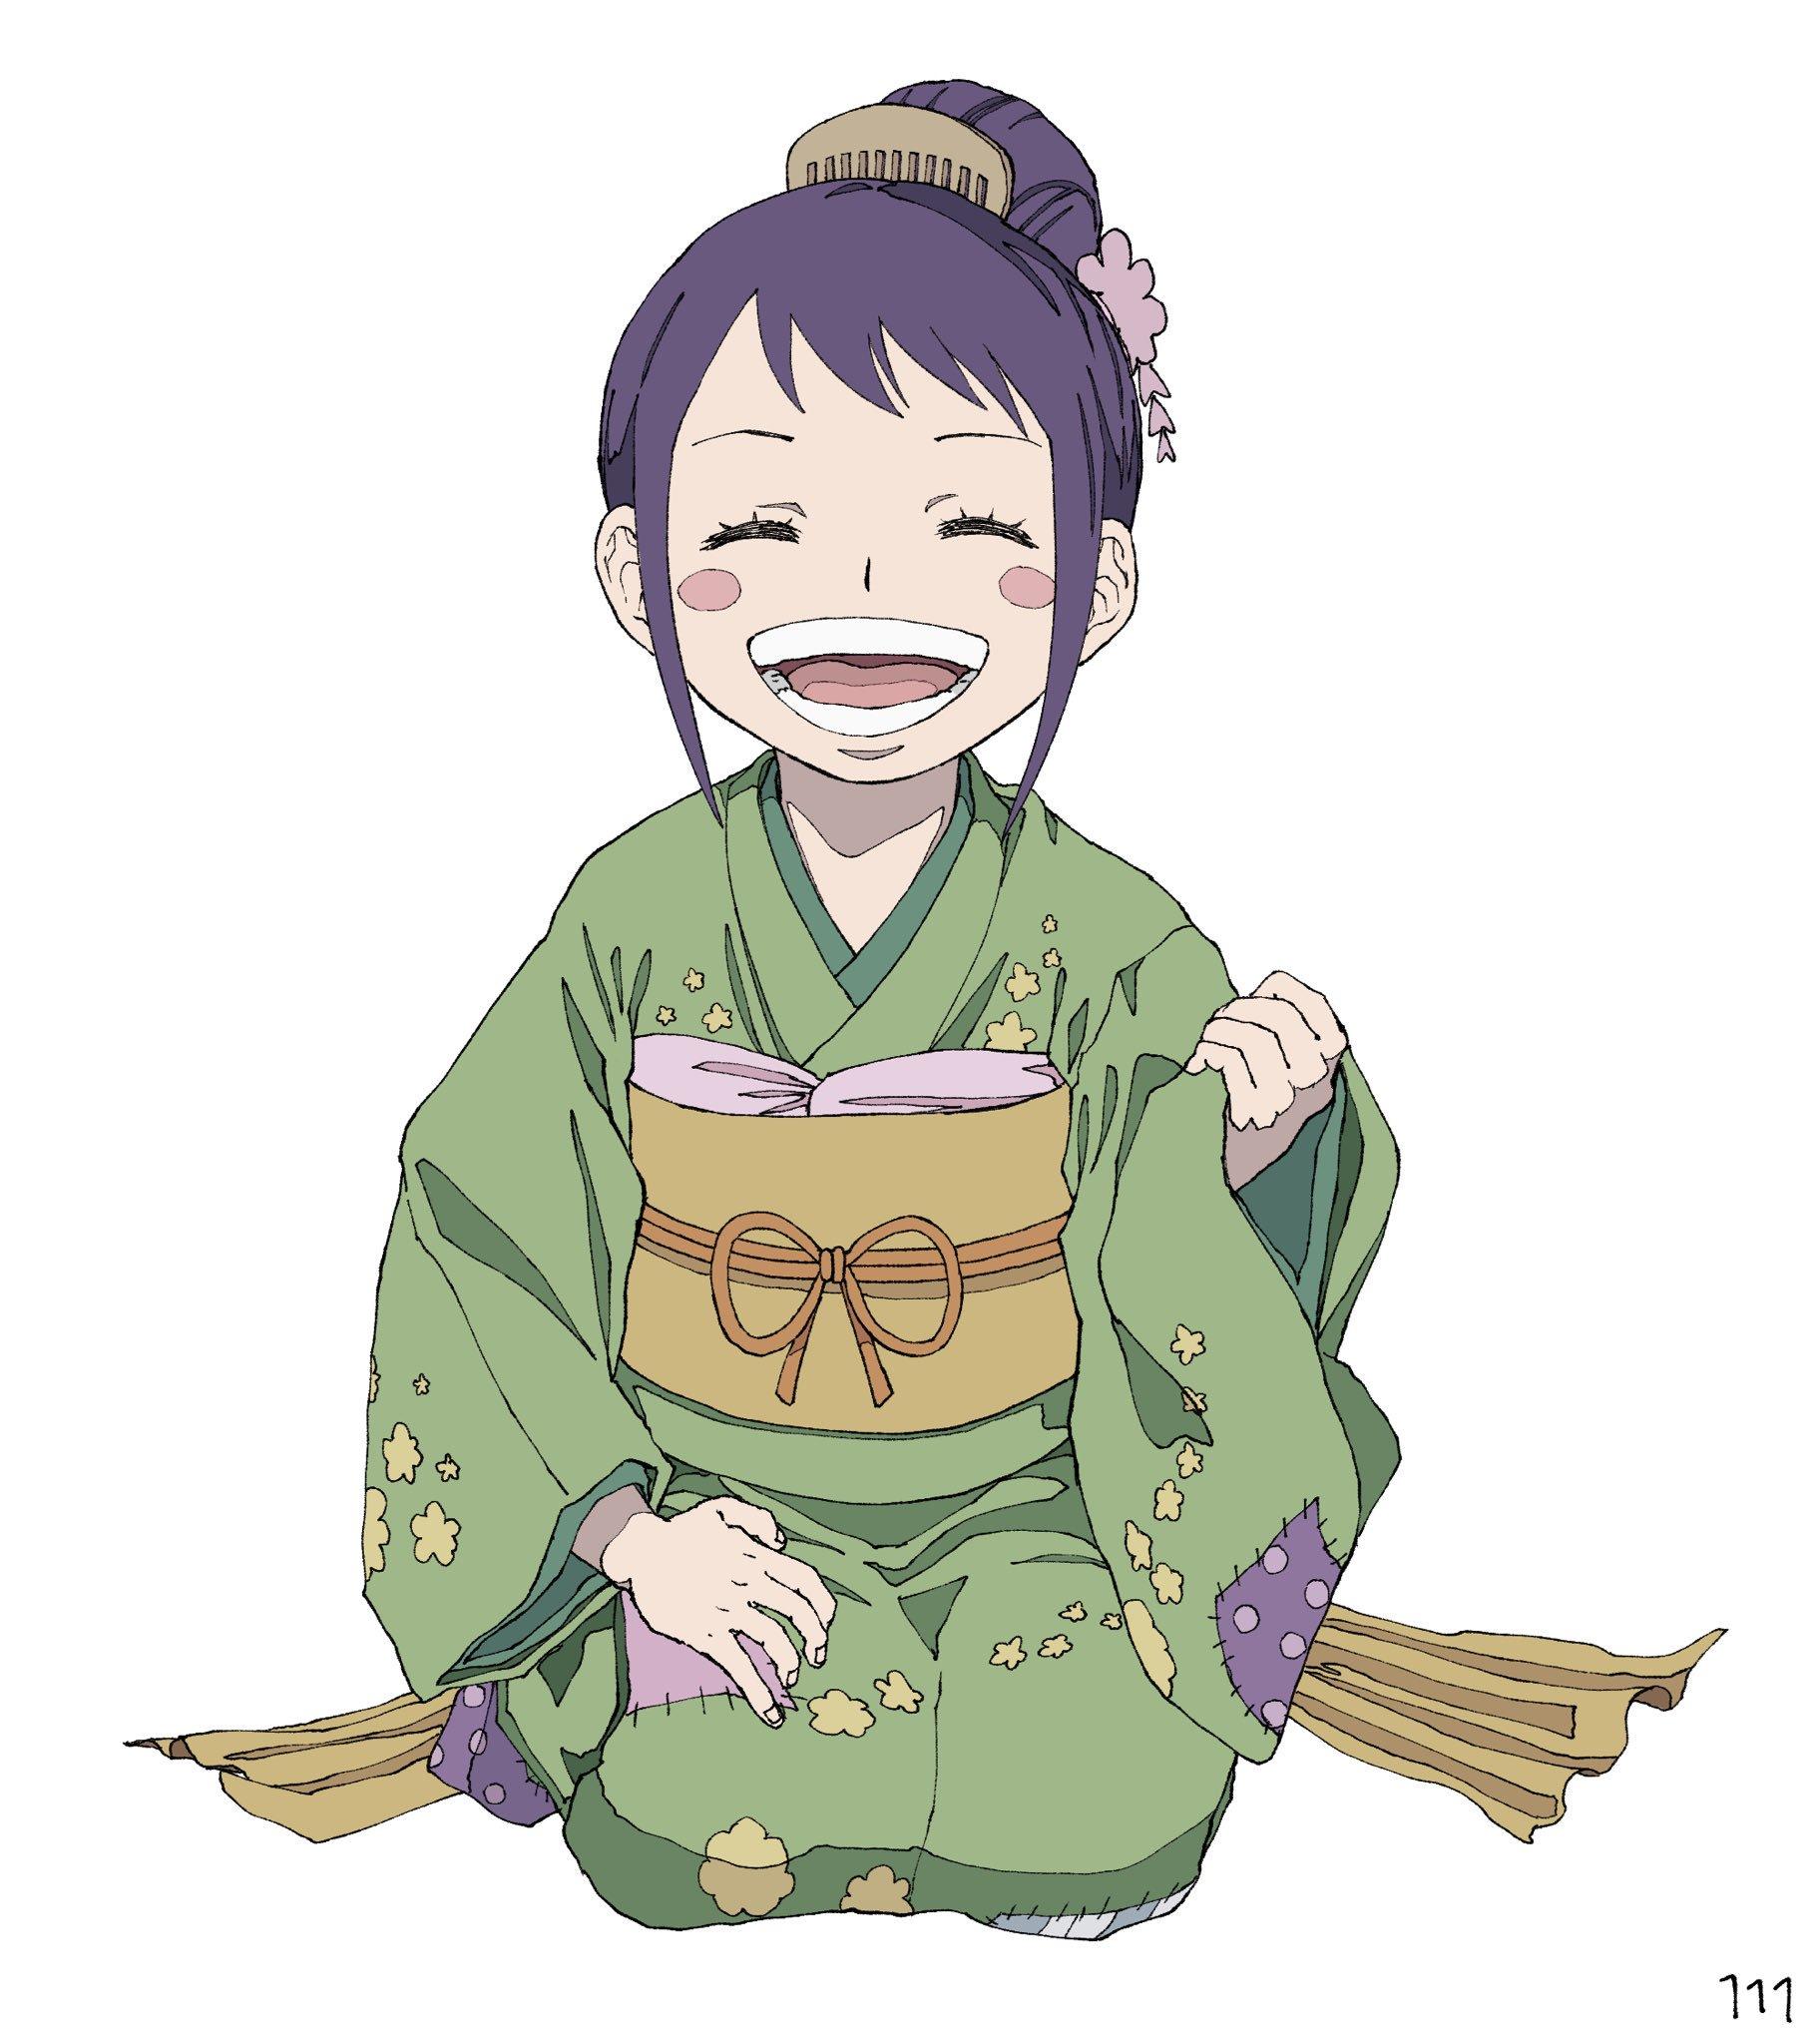 Tama (ONE PIECE) Image #2827001 - Zerochan Anime Image Board